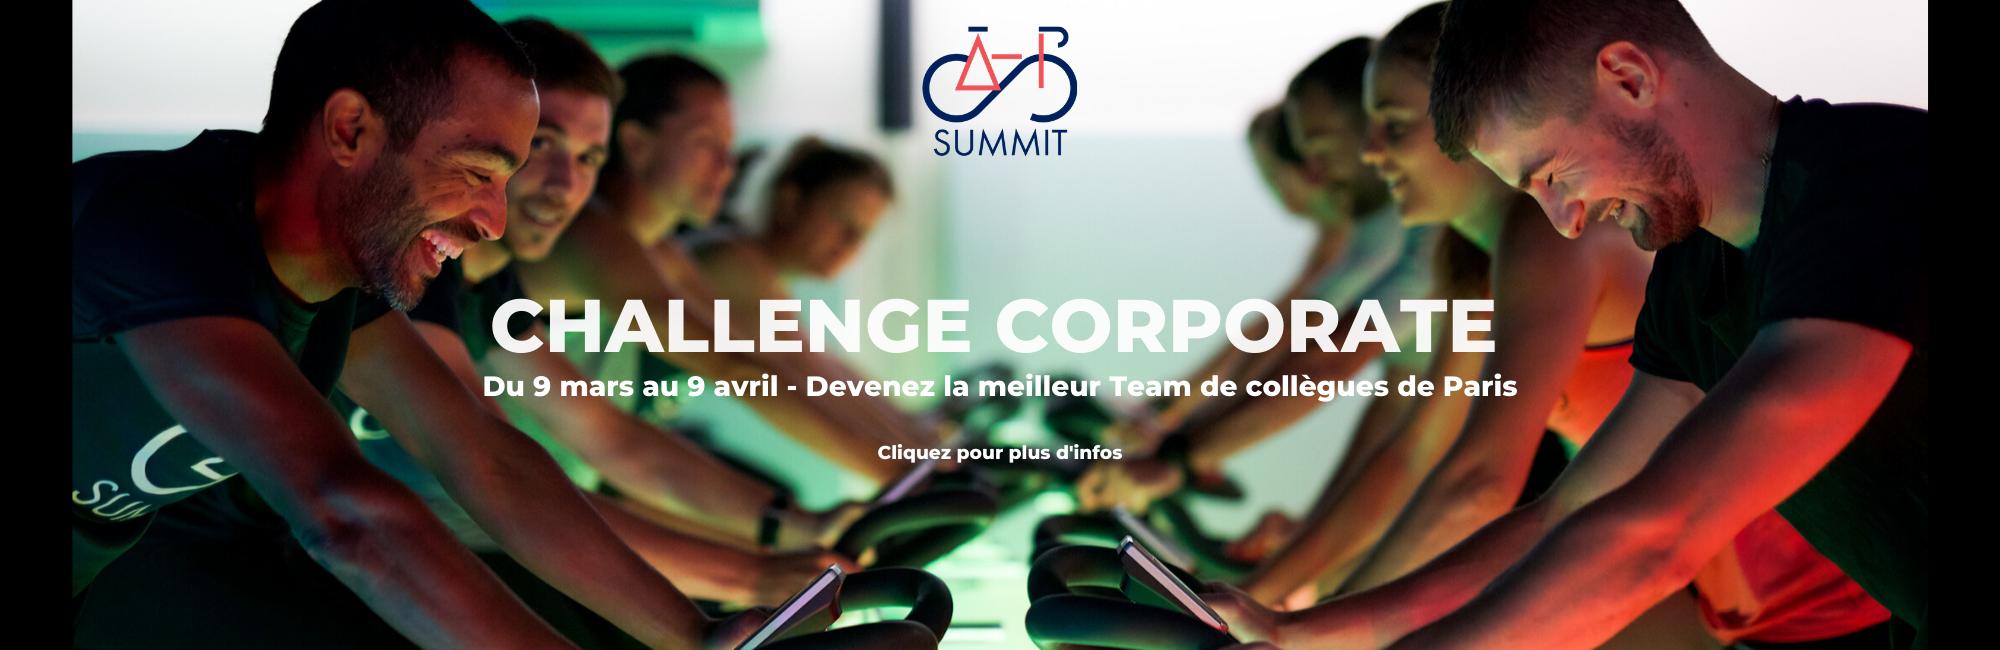 Challenge Corporate